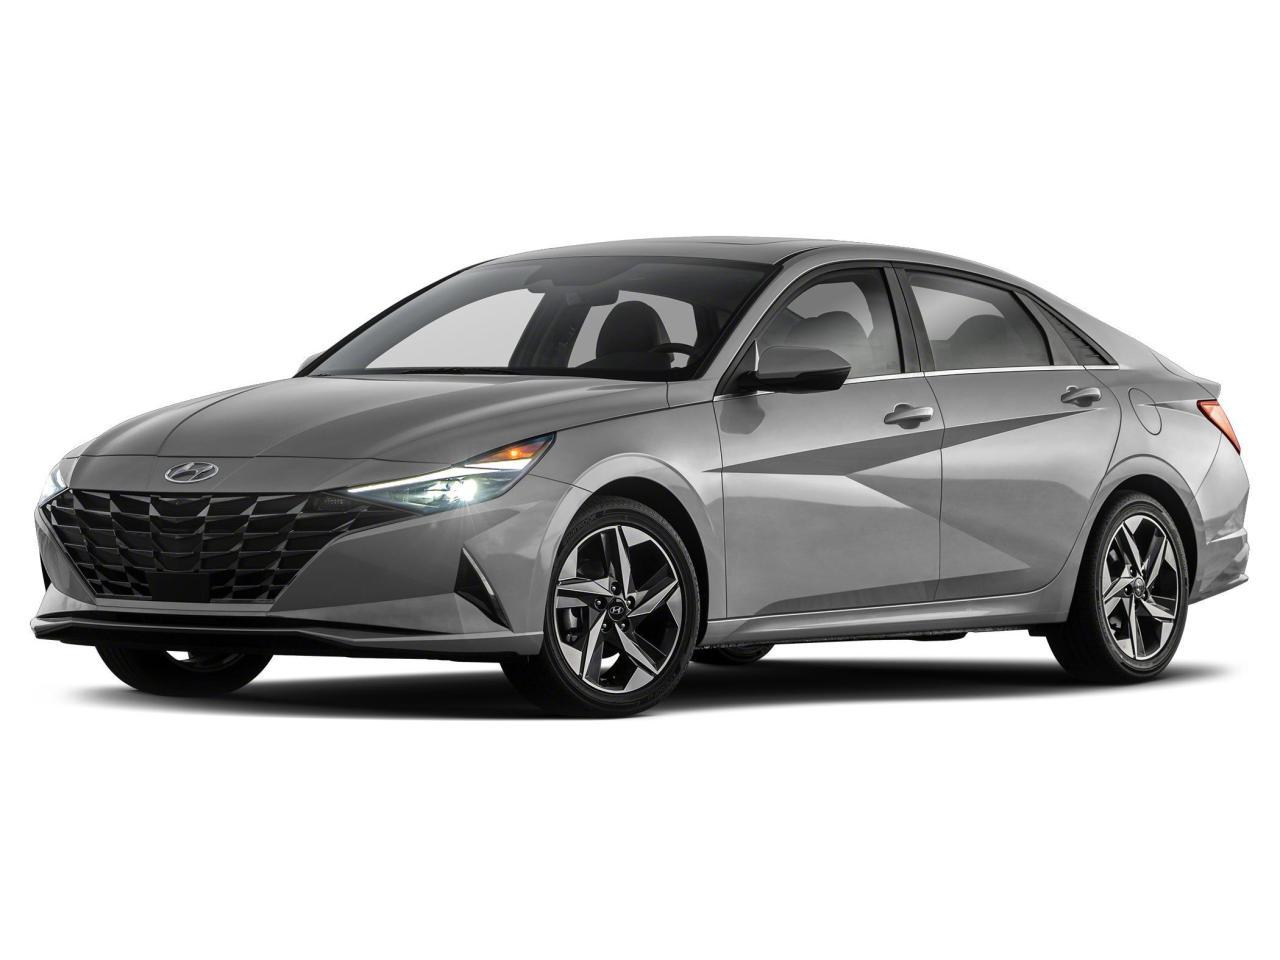 2021 Hyundai Elantra HYBRID PREFERRED NO OPTIONS